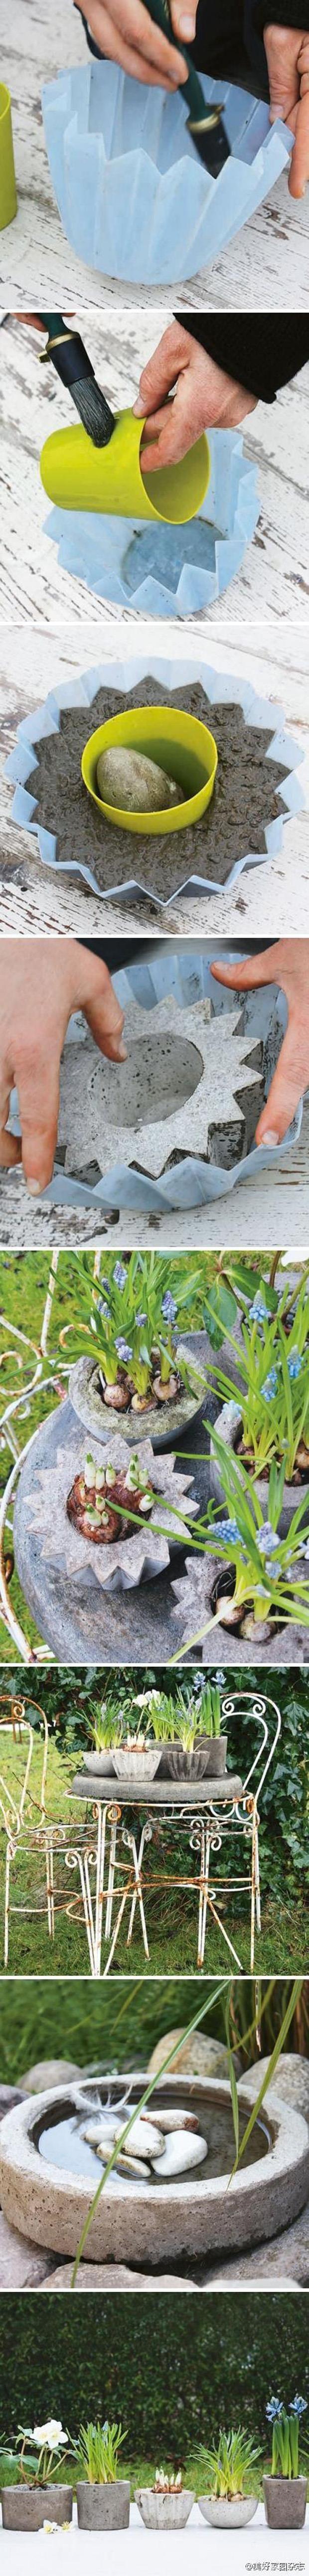 Garden decor kijiji   best Garden and craft images on Pinterest  Glass art Stained